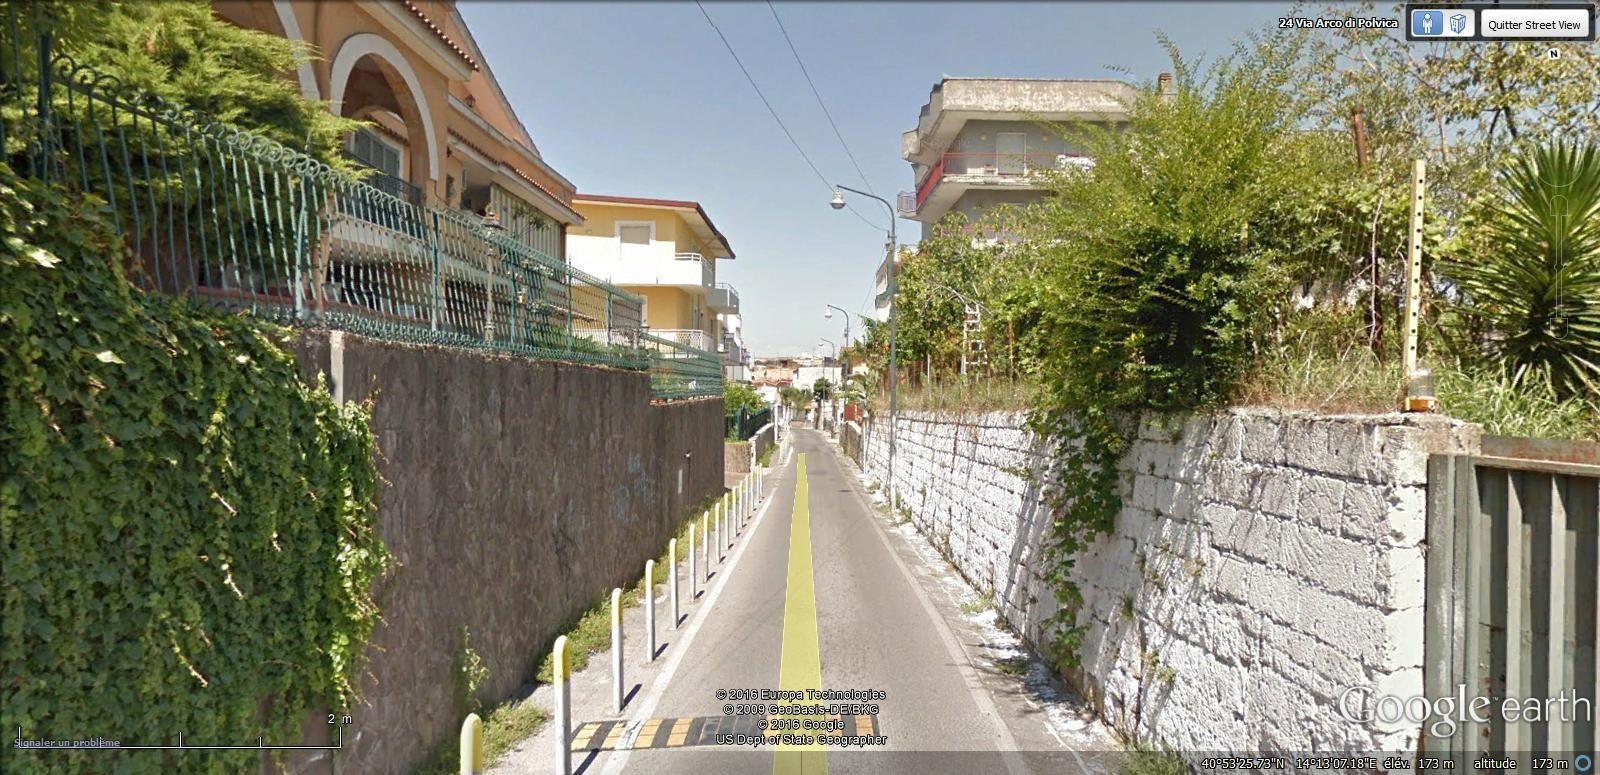 via Arco di Polvica